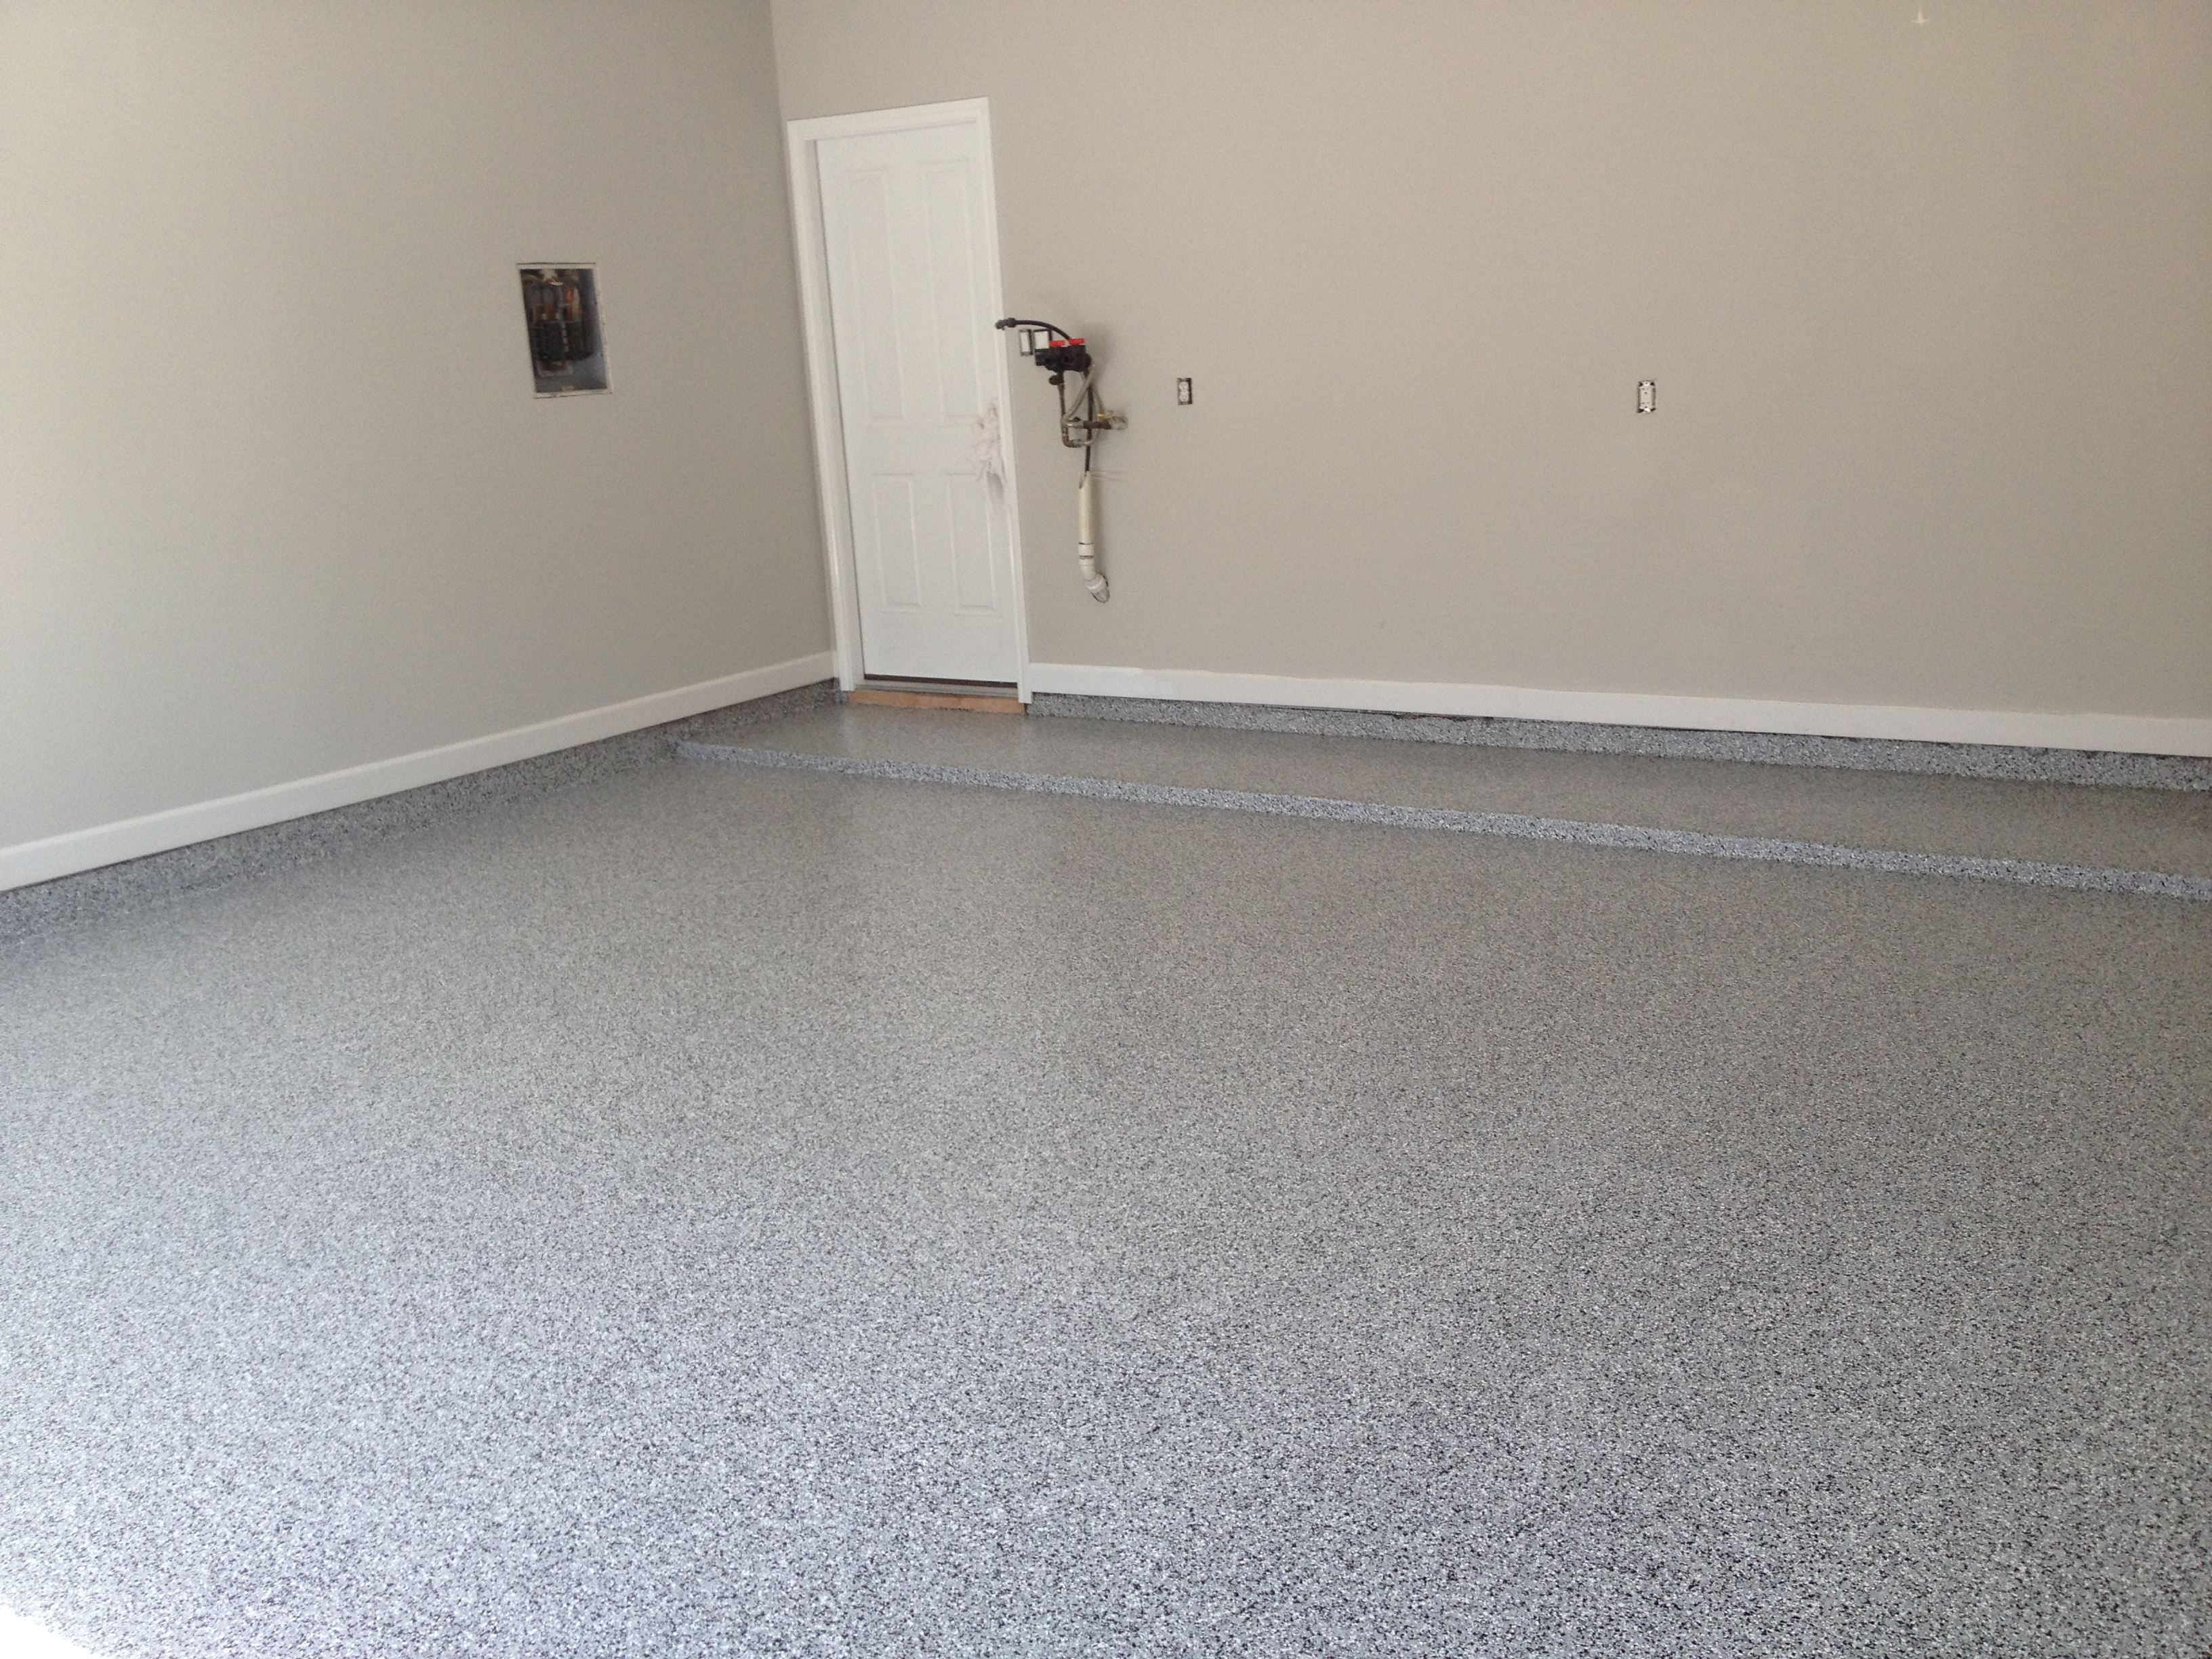 san antonio granite floor coating garage flooring project OIBGUFH